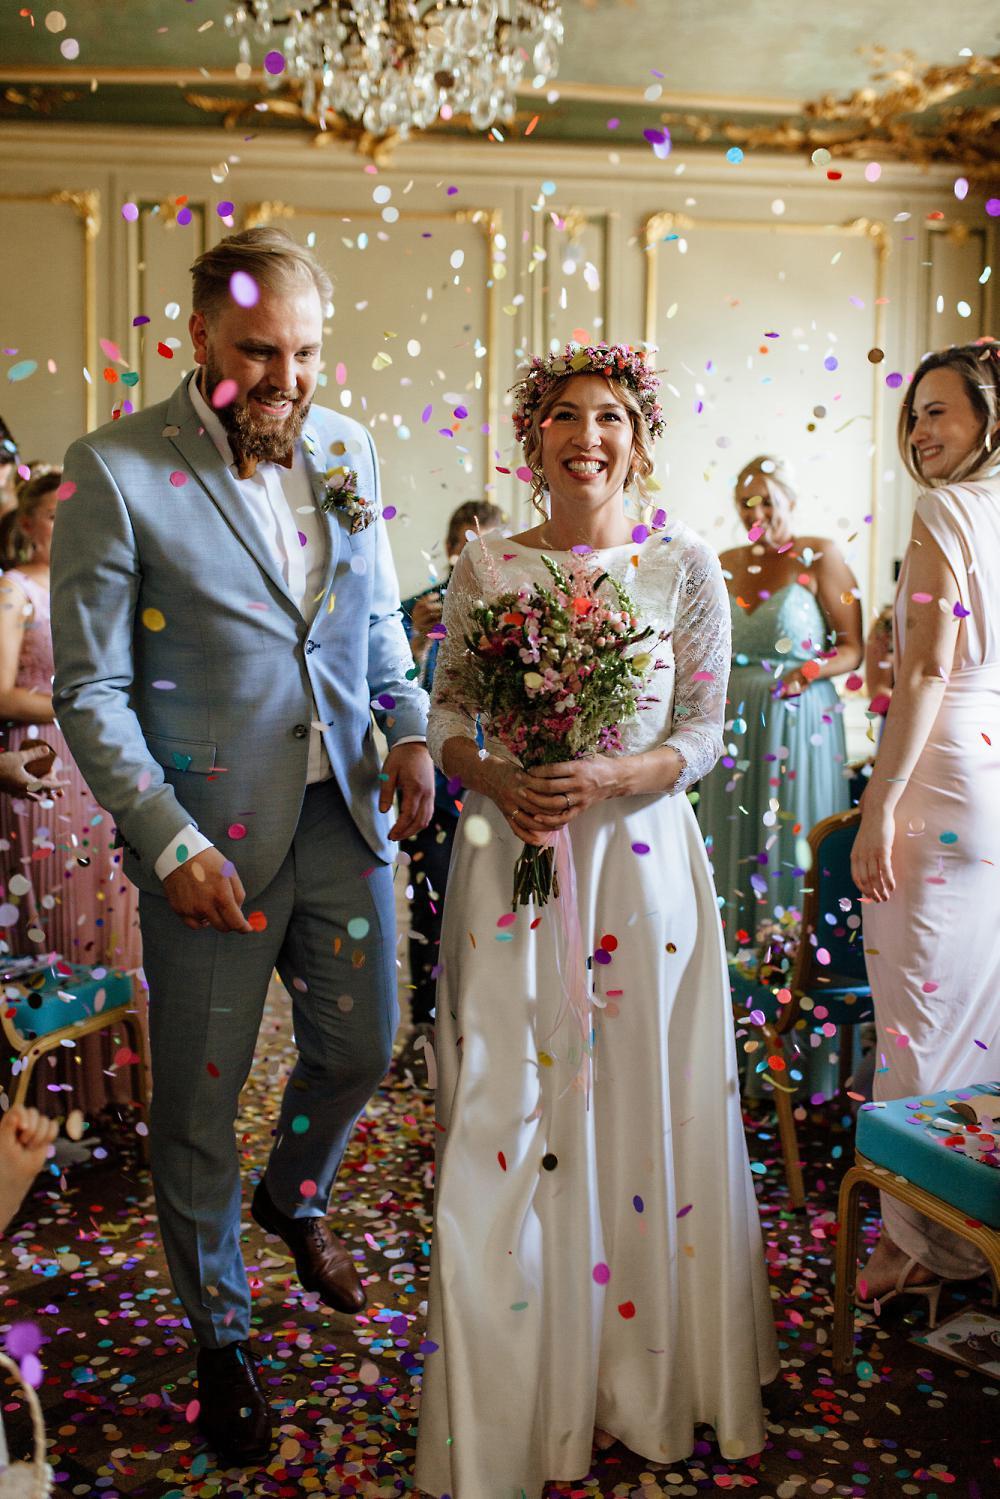 komorebi-Hochzeitsfotograf-7456_WEB.jpg